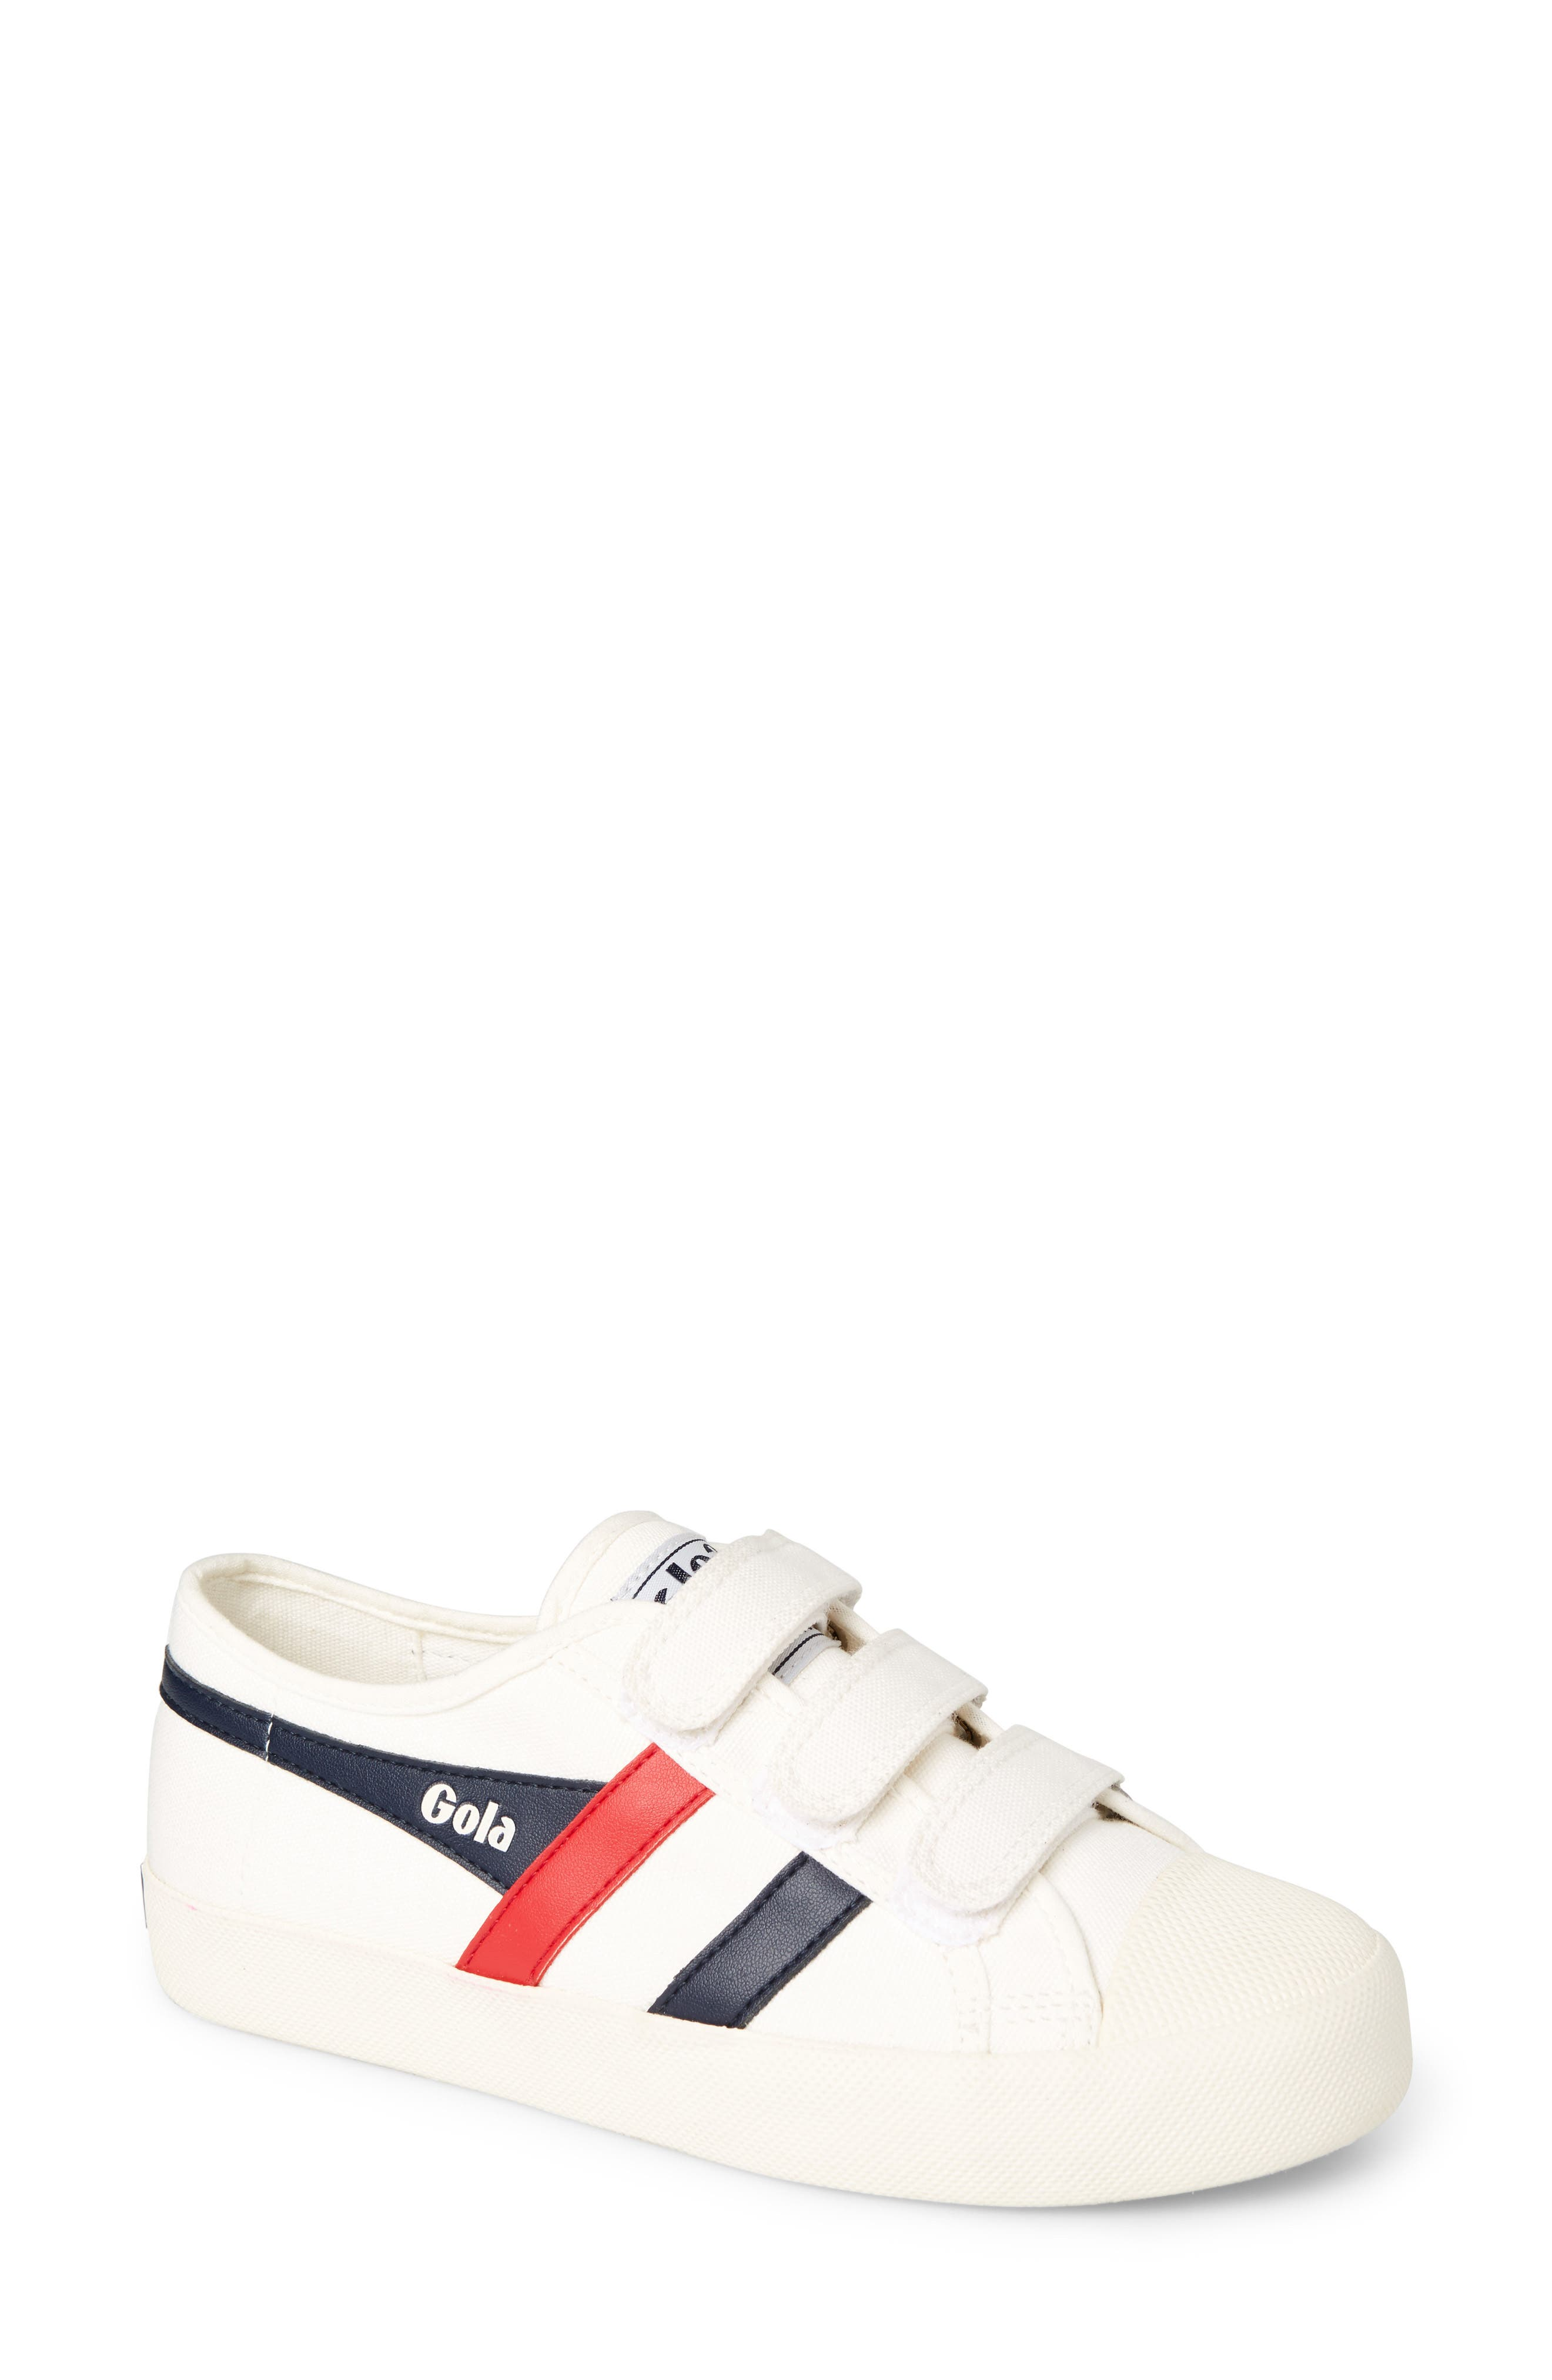 Coaster Low Top Sneaker